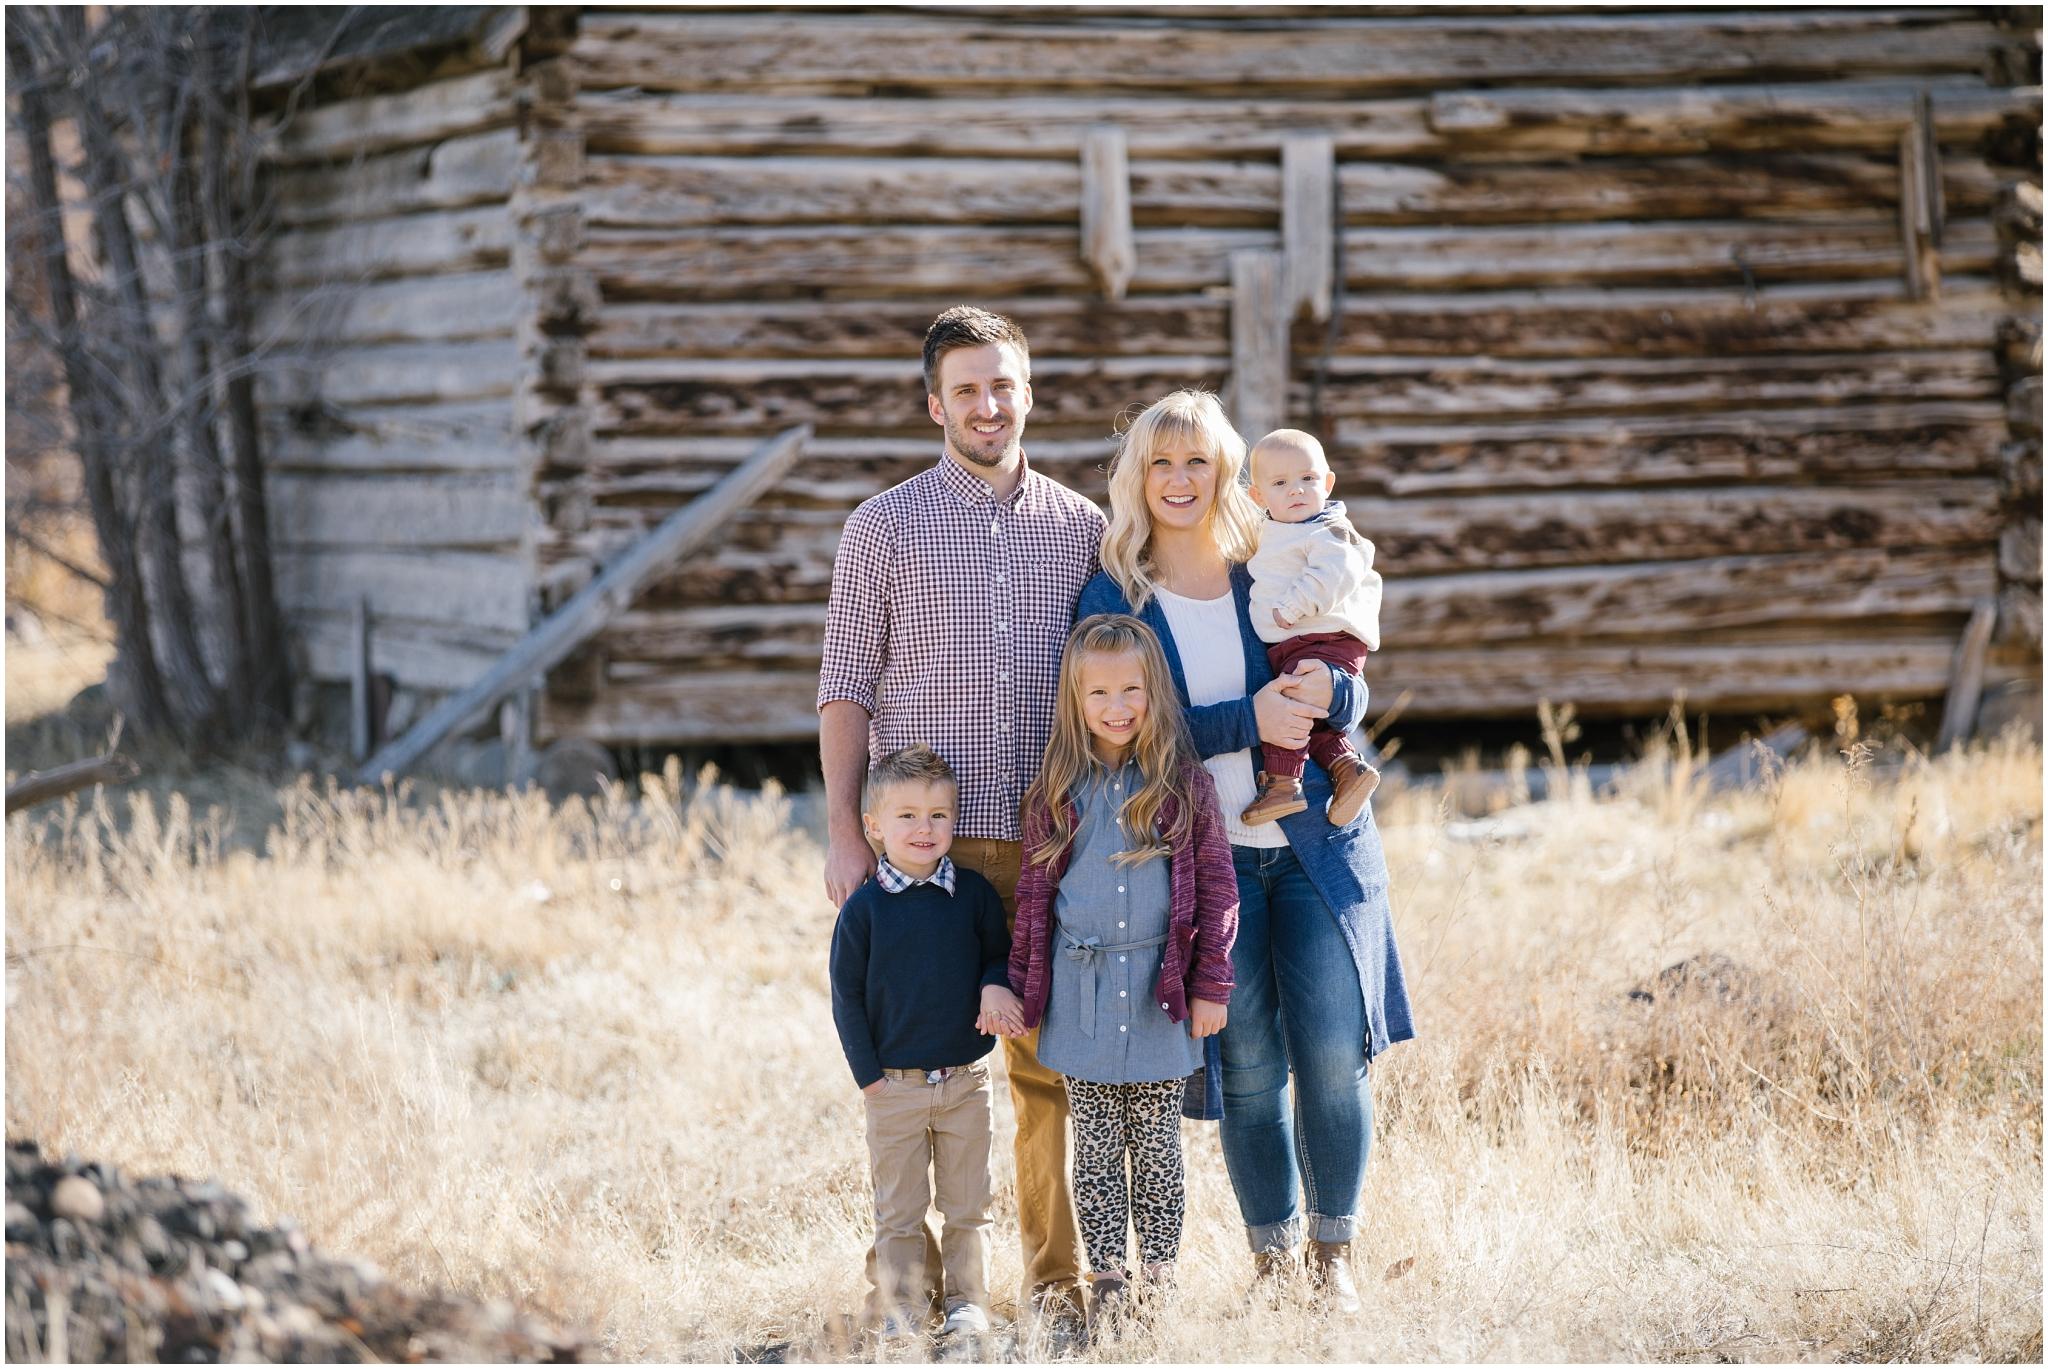 Laws-79_Lizzie-B-Imagery-Utah-Family-Photographer-Salt-Lake-City-Park-City-Davis-County-Clearfield.jpg